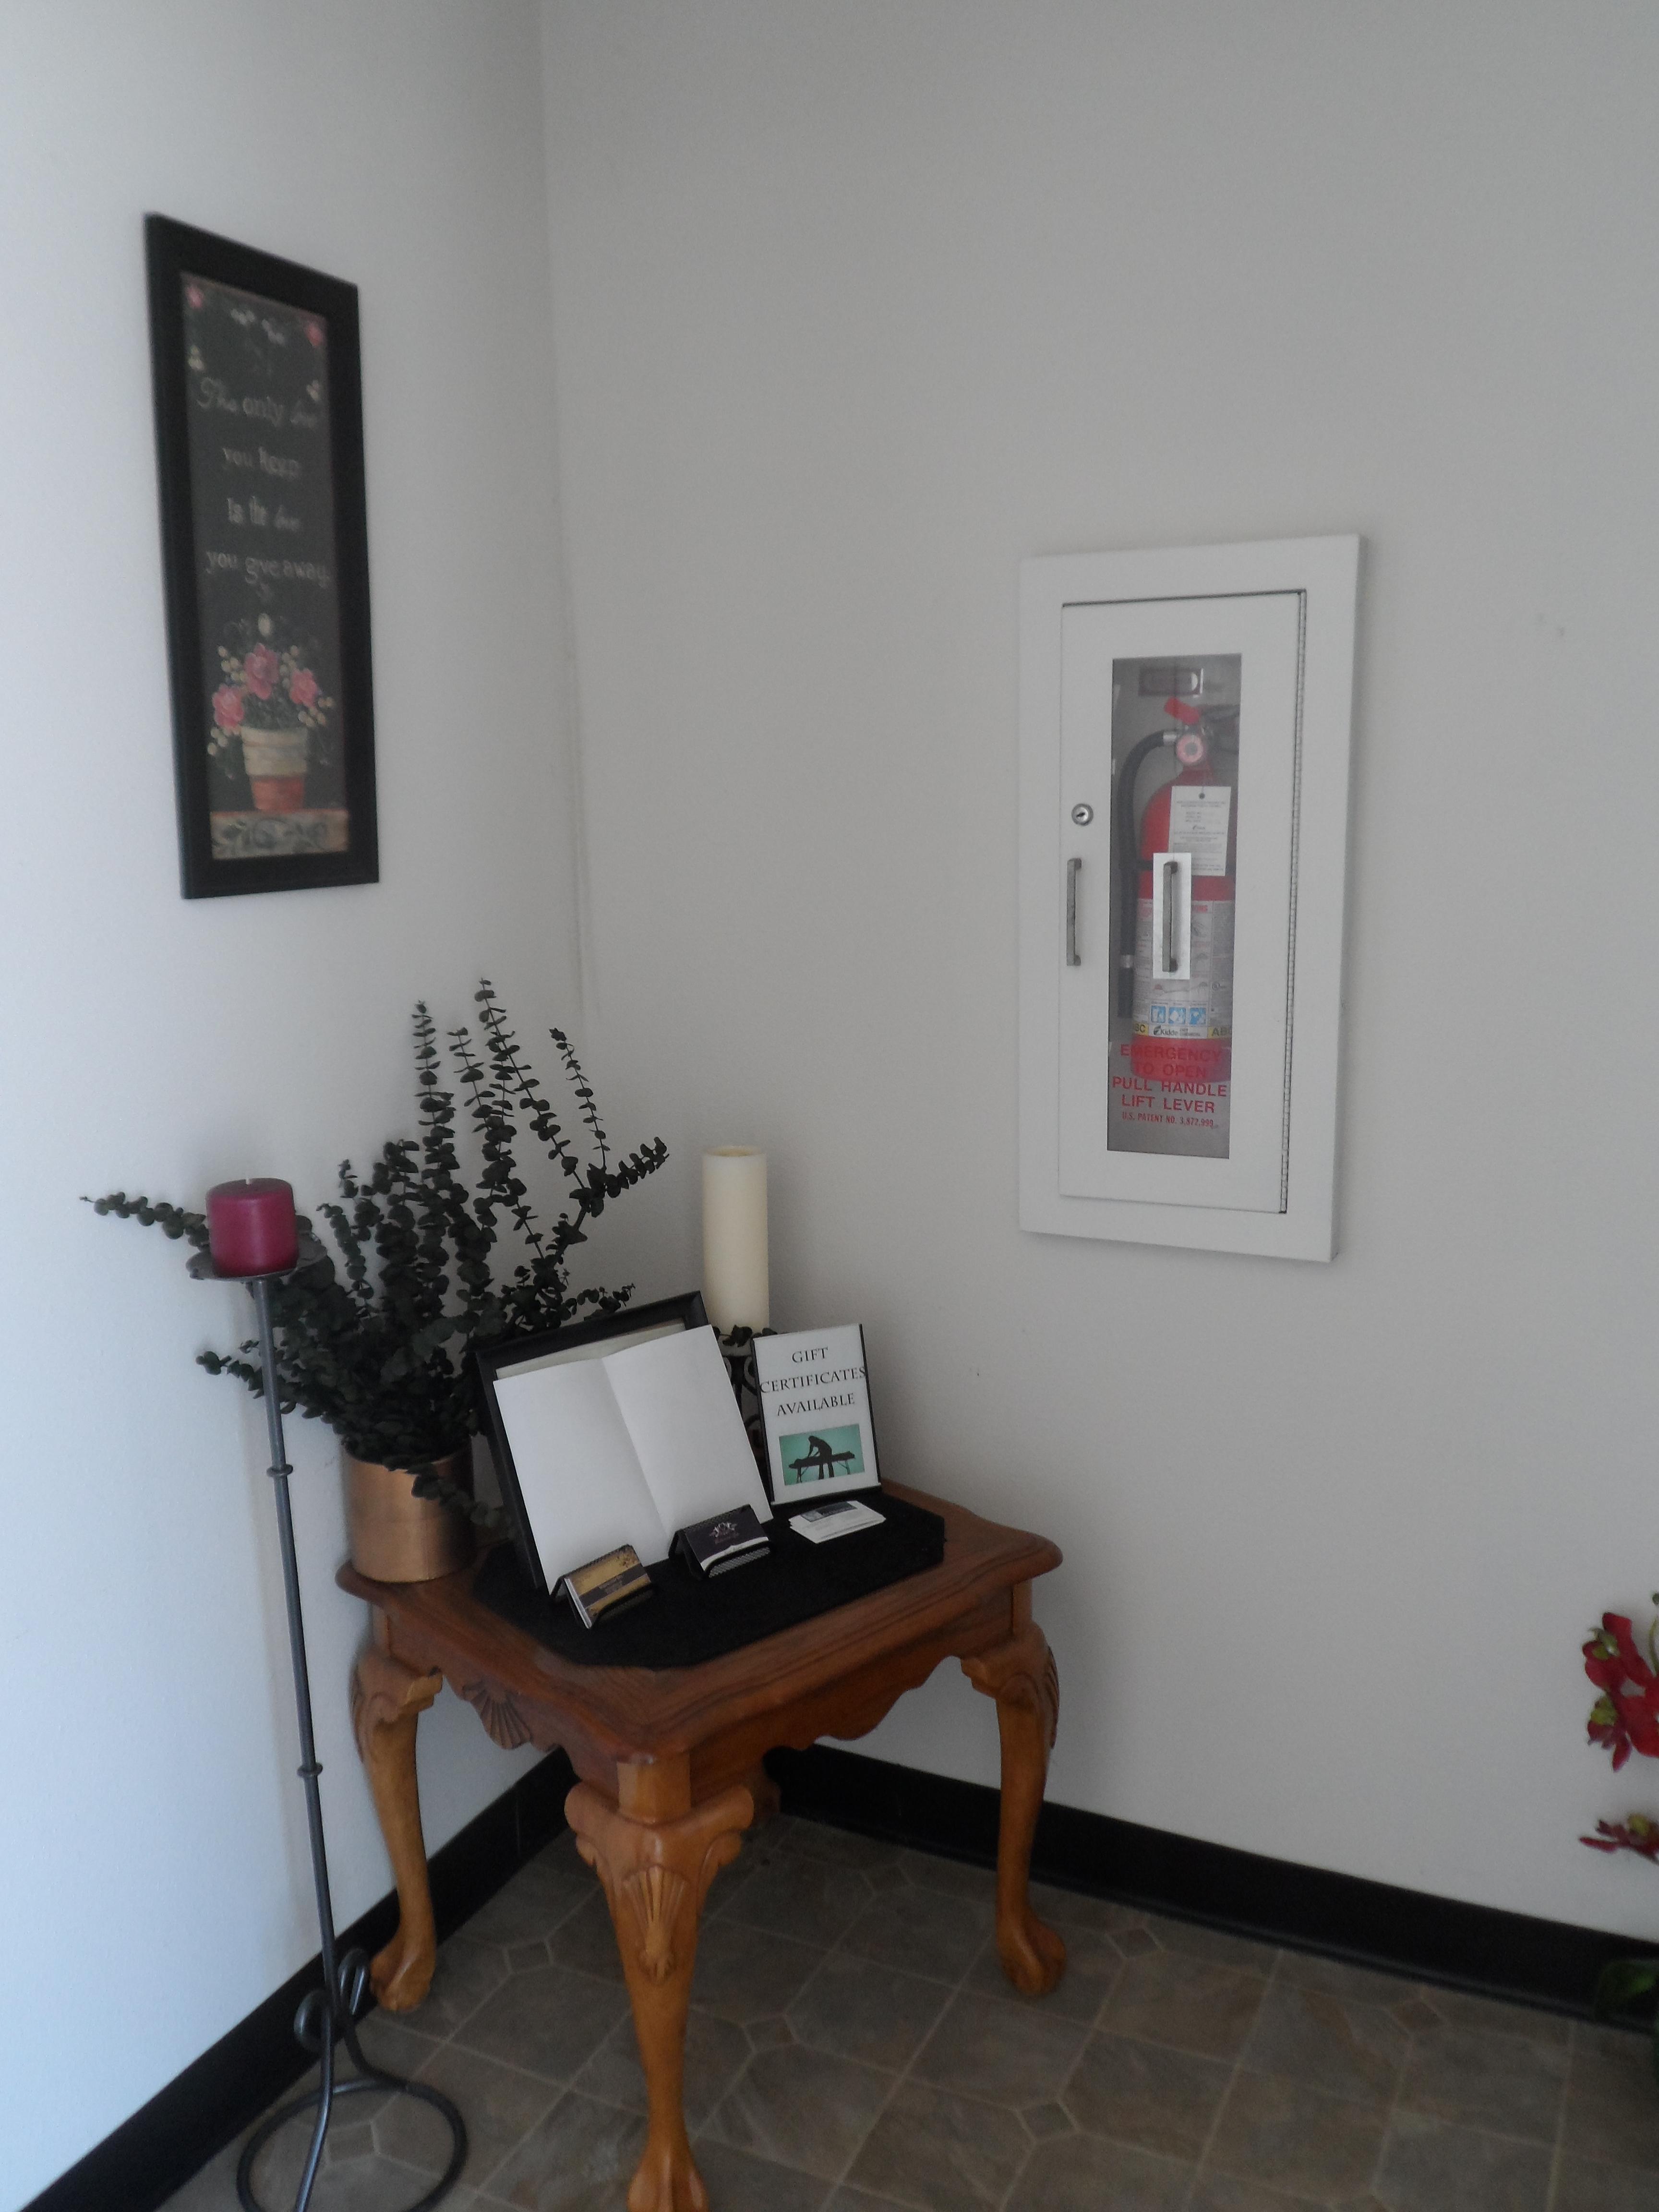 Fire Hnder Massage Terapi